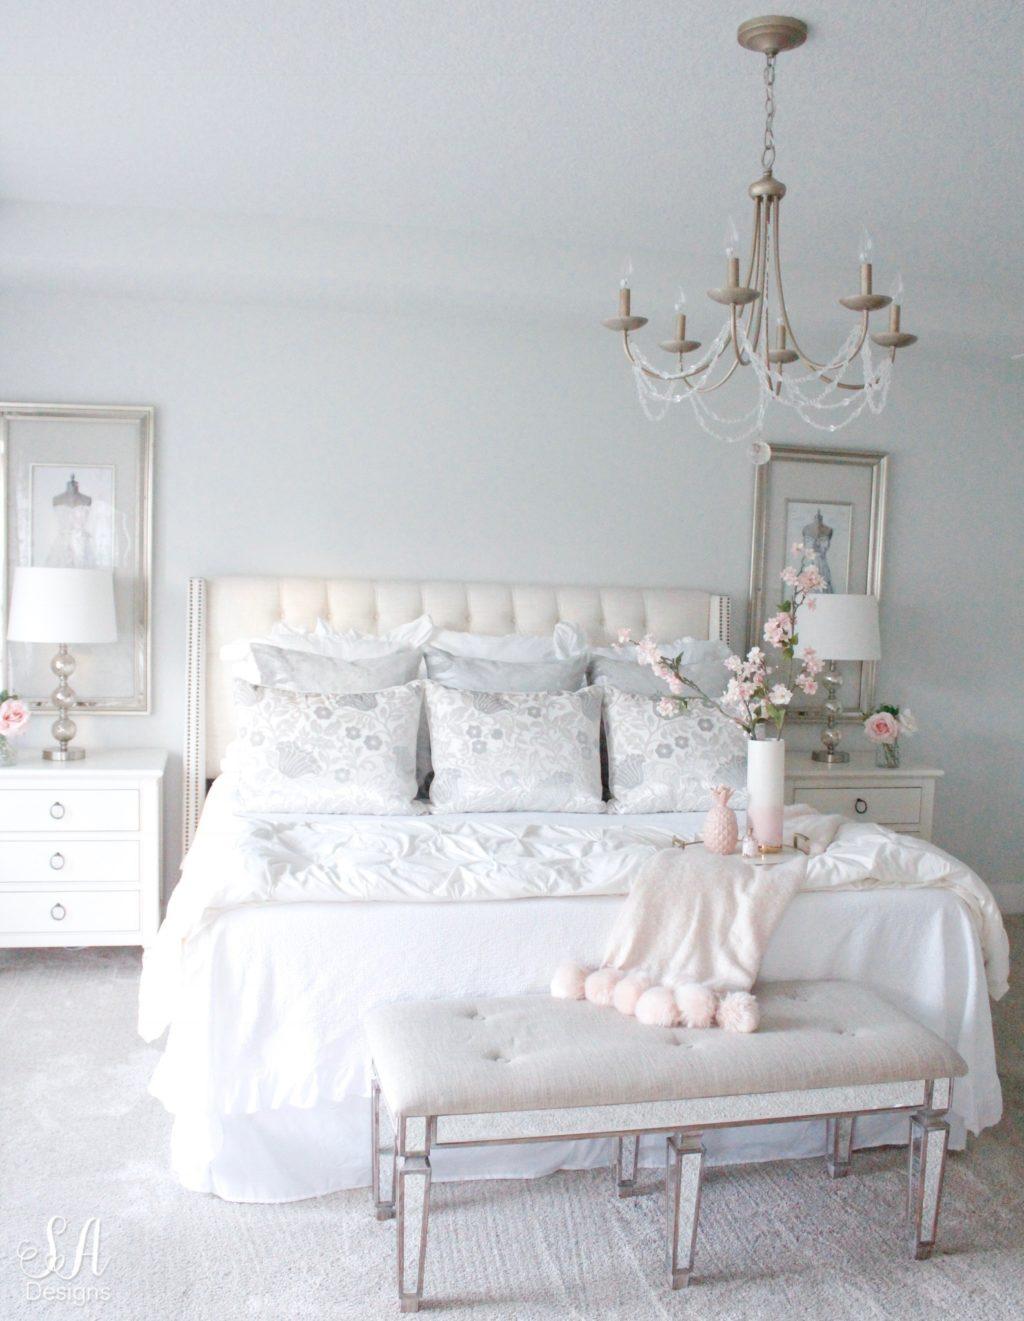 Nordstrom At Home Throw Blanket Blush Tones Neutral Elegant Bedroom Gray Owl